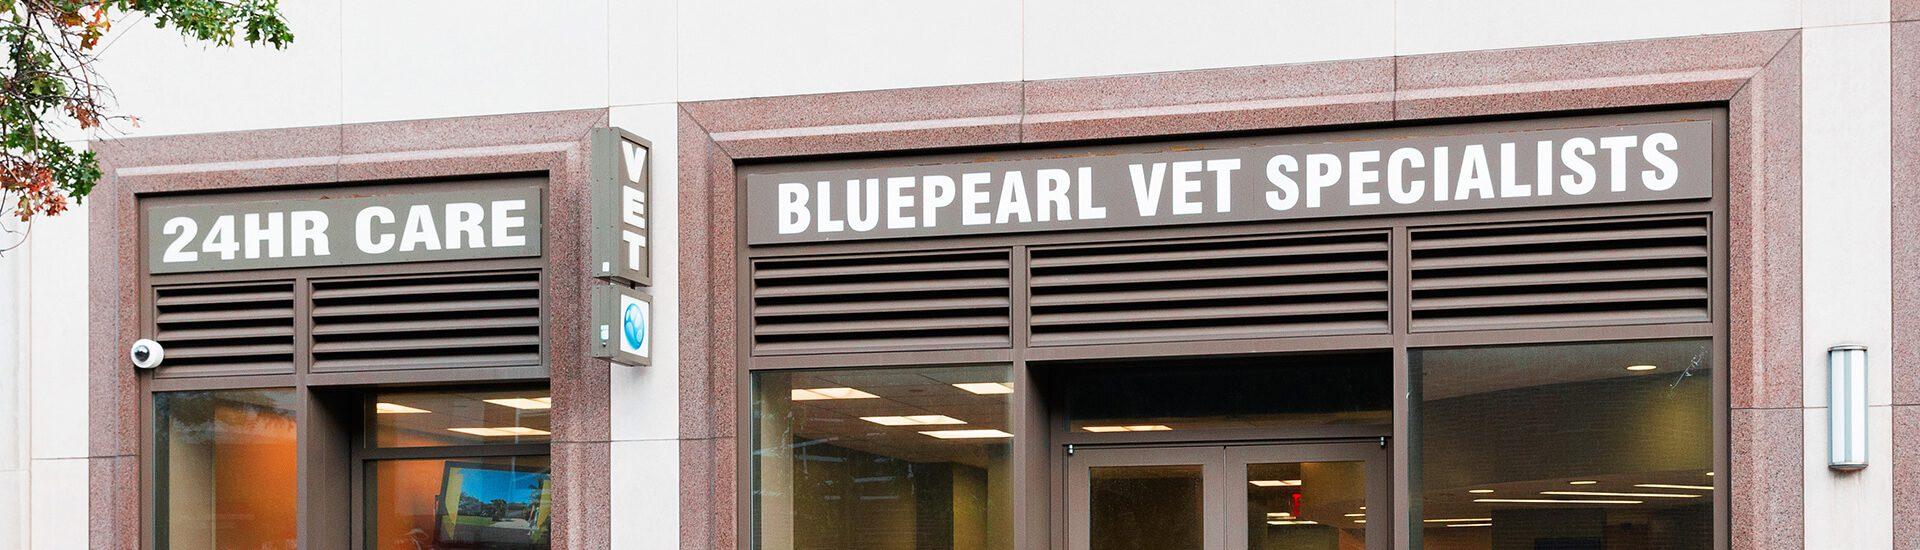 bluepearl pet hospital queens ny emergency vet. Black Bedroom Furniture Sets. Home Design Ideas